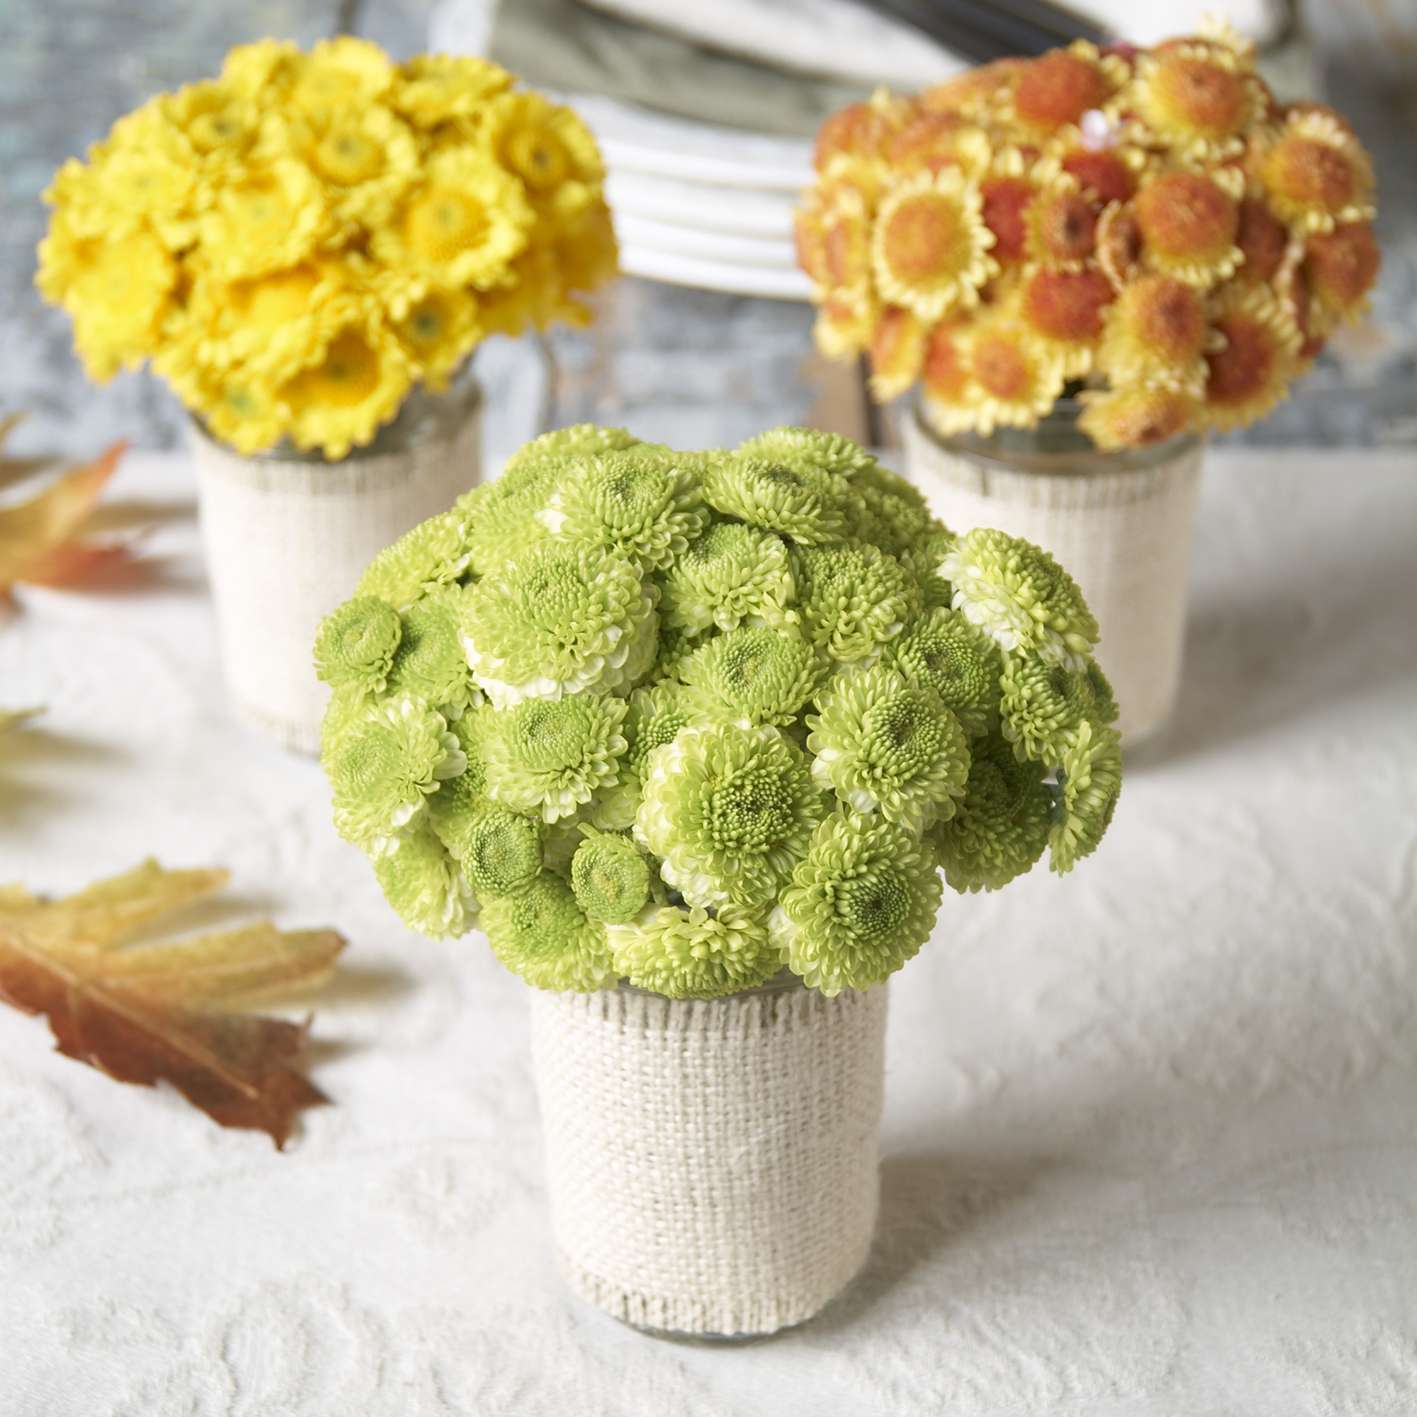 Yellow, green and orange chrysanthemum bouquets